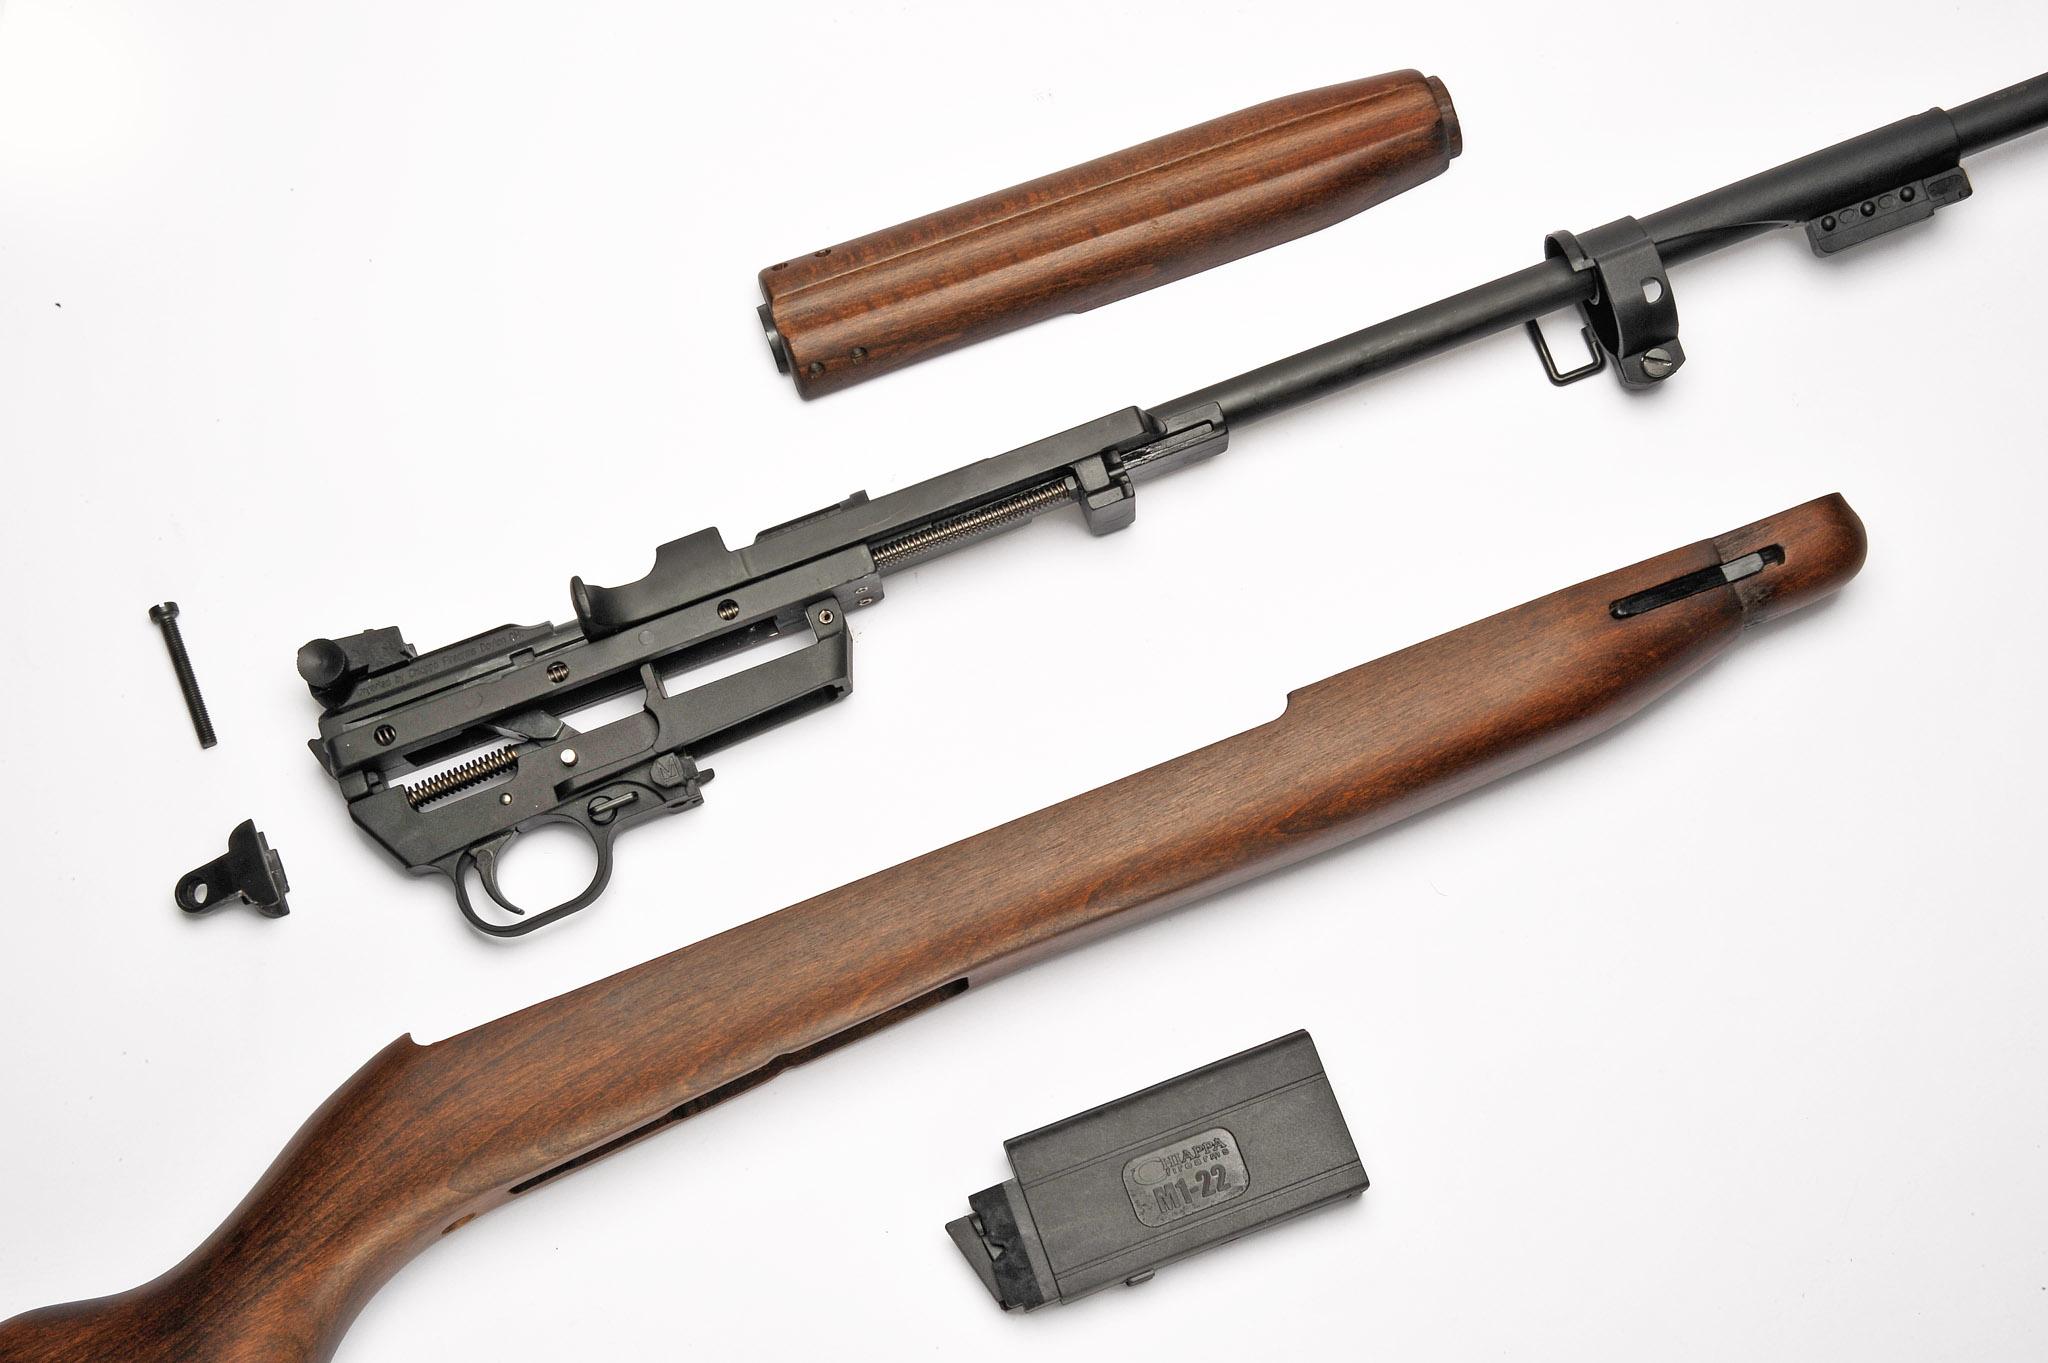 Chiappa Firearms M1-22 (page 3) - Chiappa Firearms ...